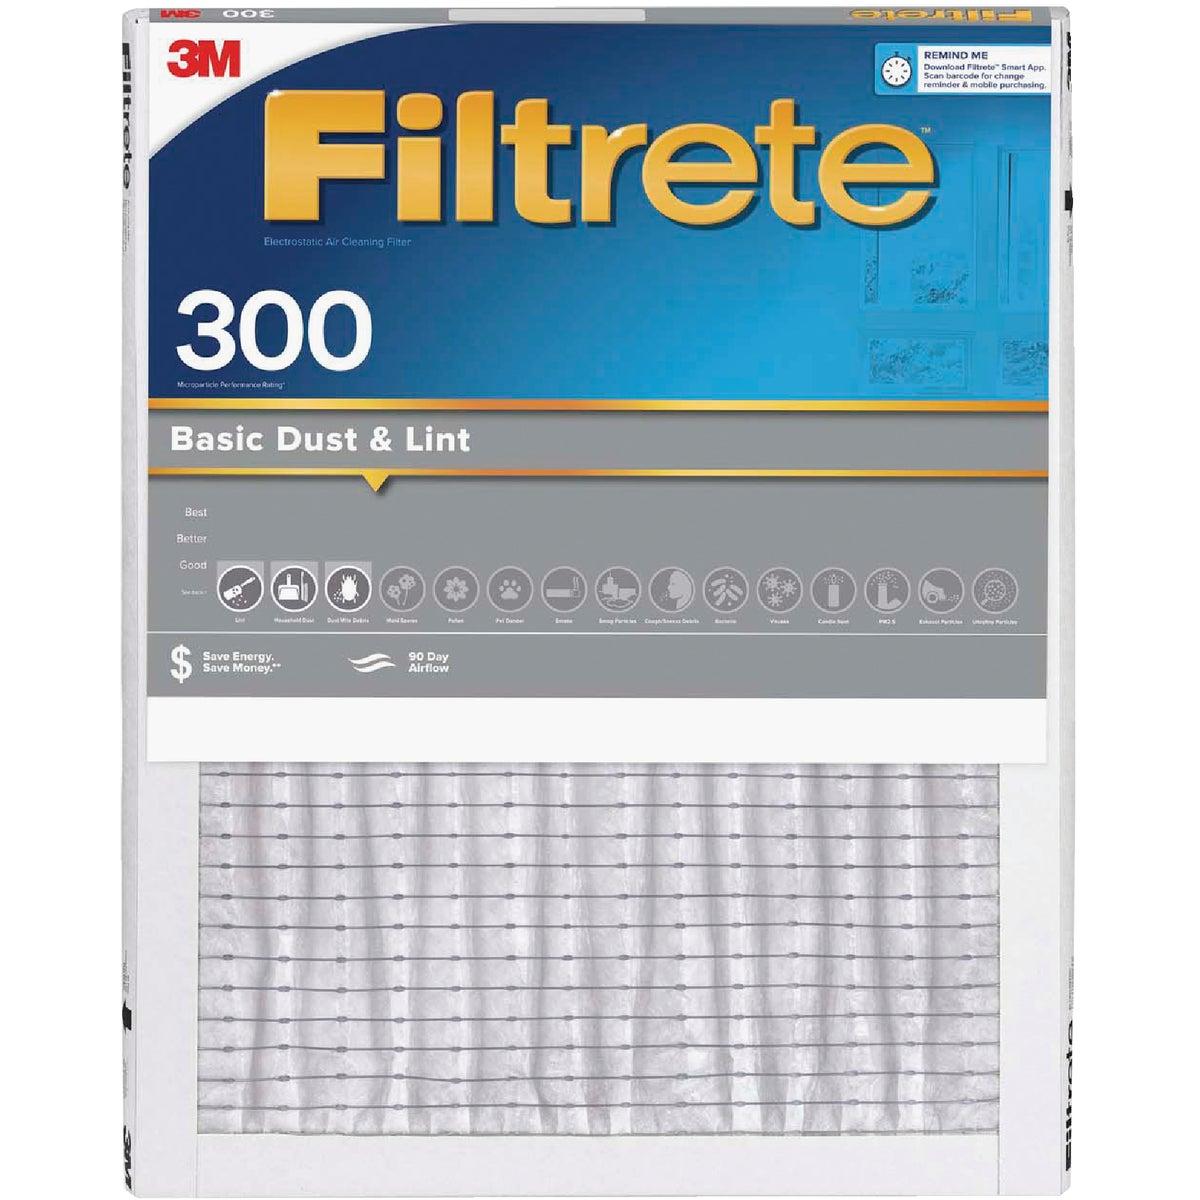 3M Filtrete 14 In. x 30 In. x 1 In. Dust Reduction 300 MPR Furnace Filter